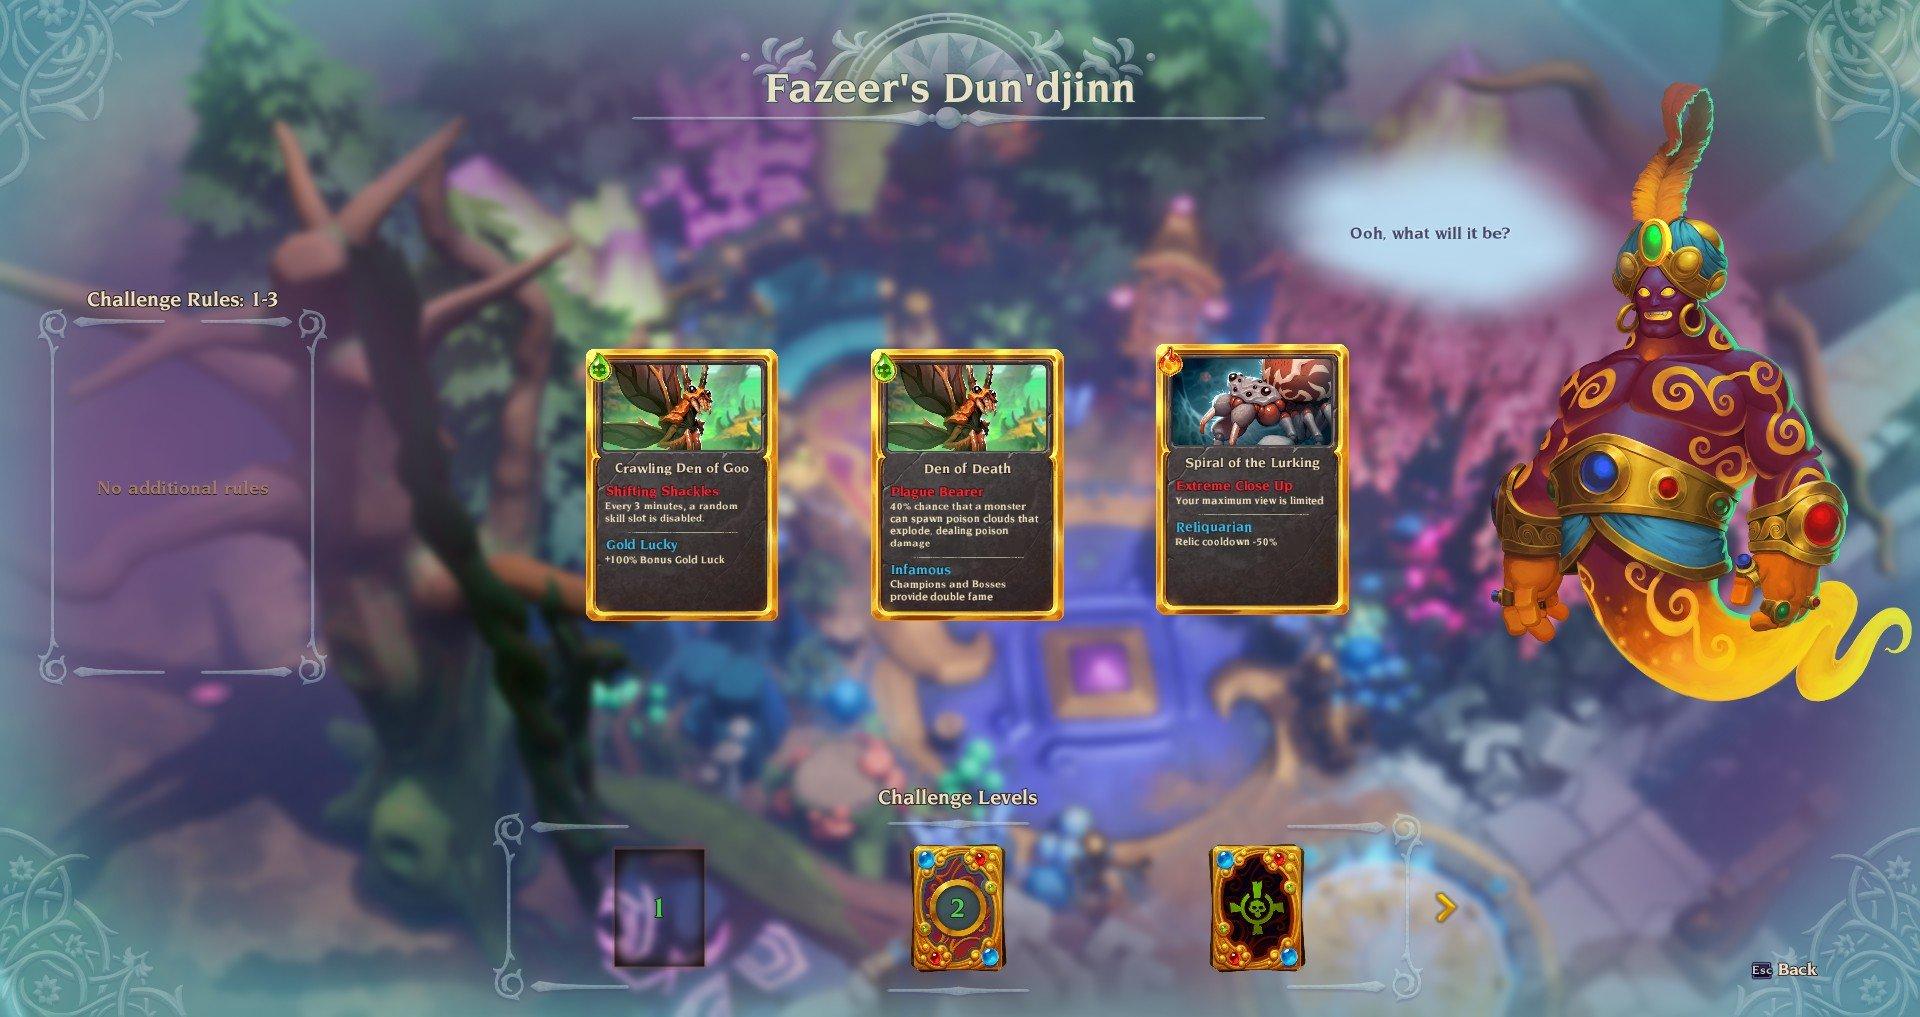 Torchlight 3 introdotto Dund'djinn di Fazeer il contenuto endgame